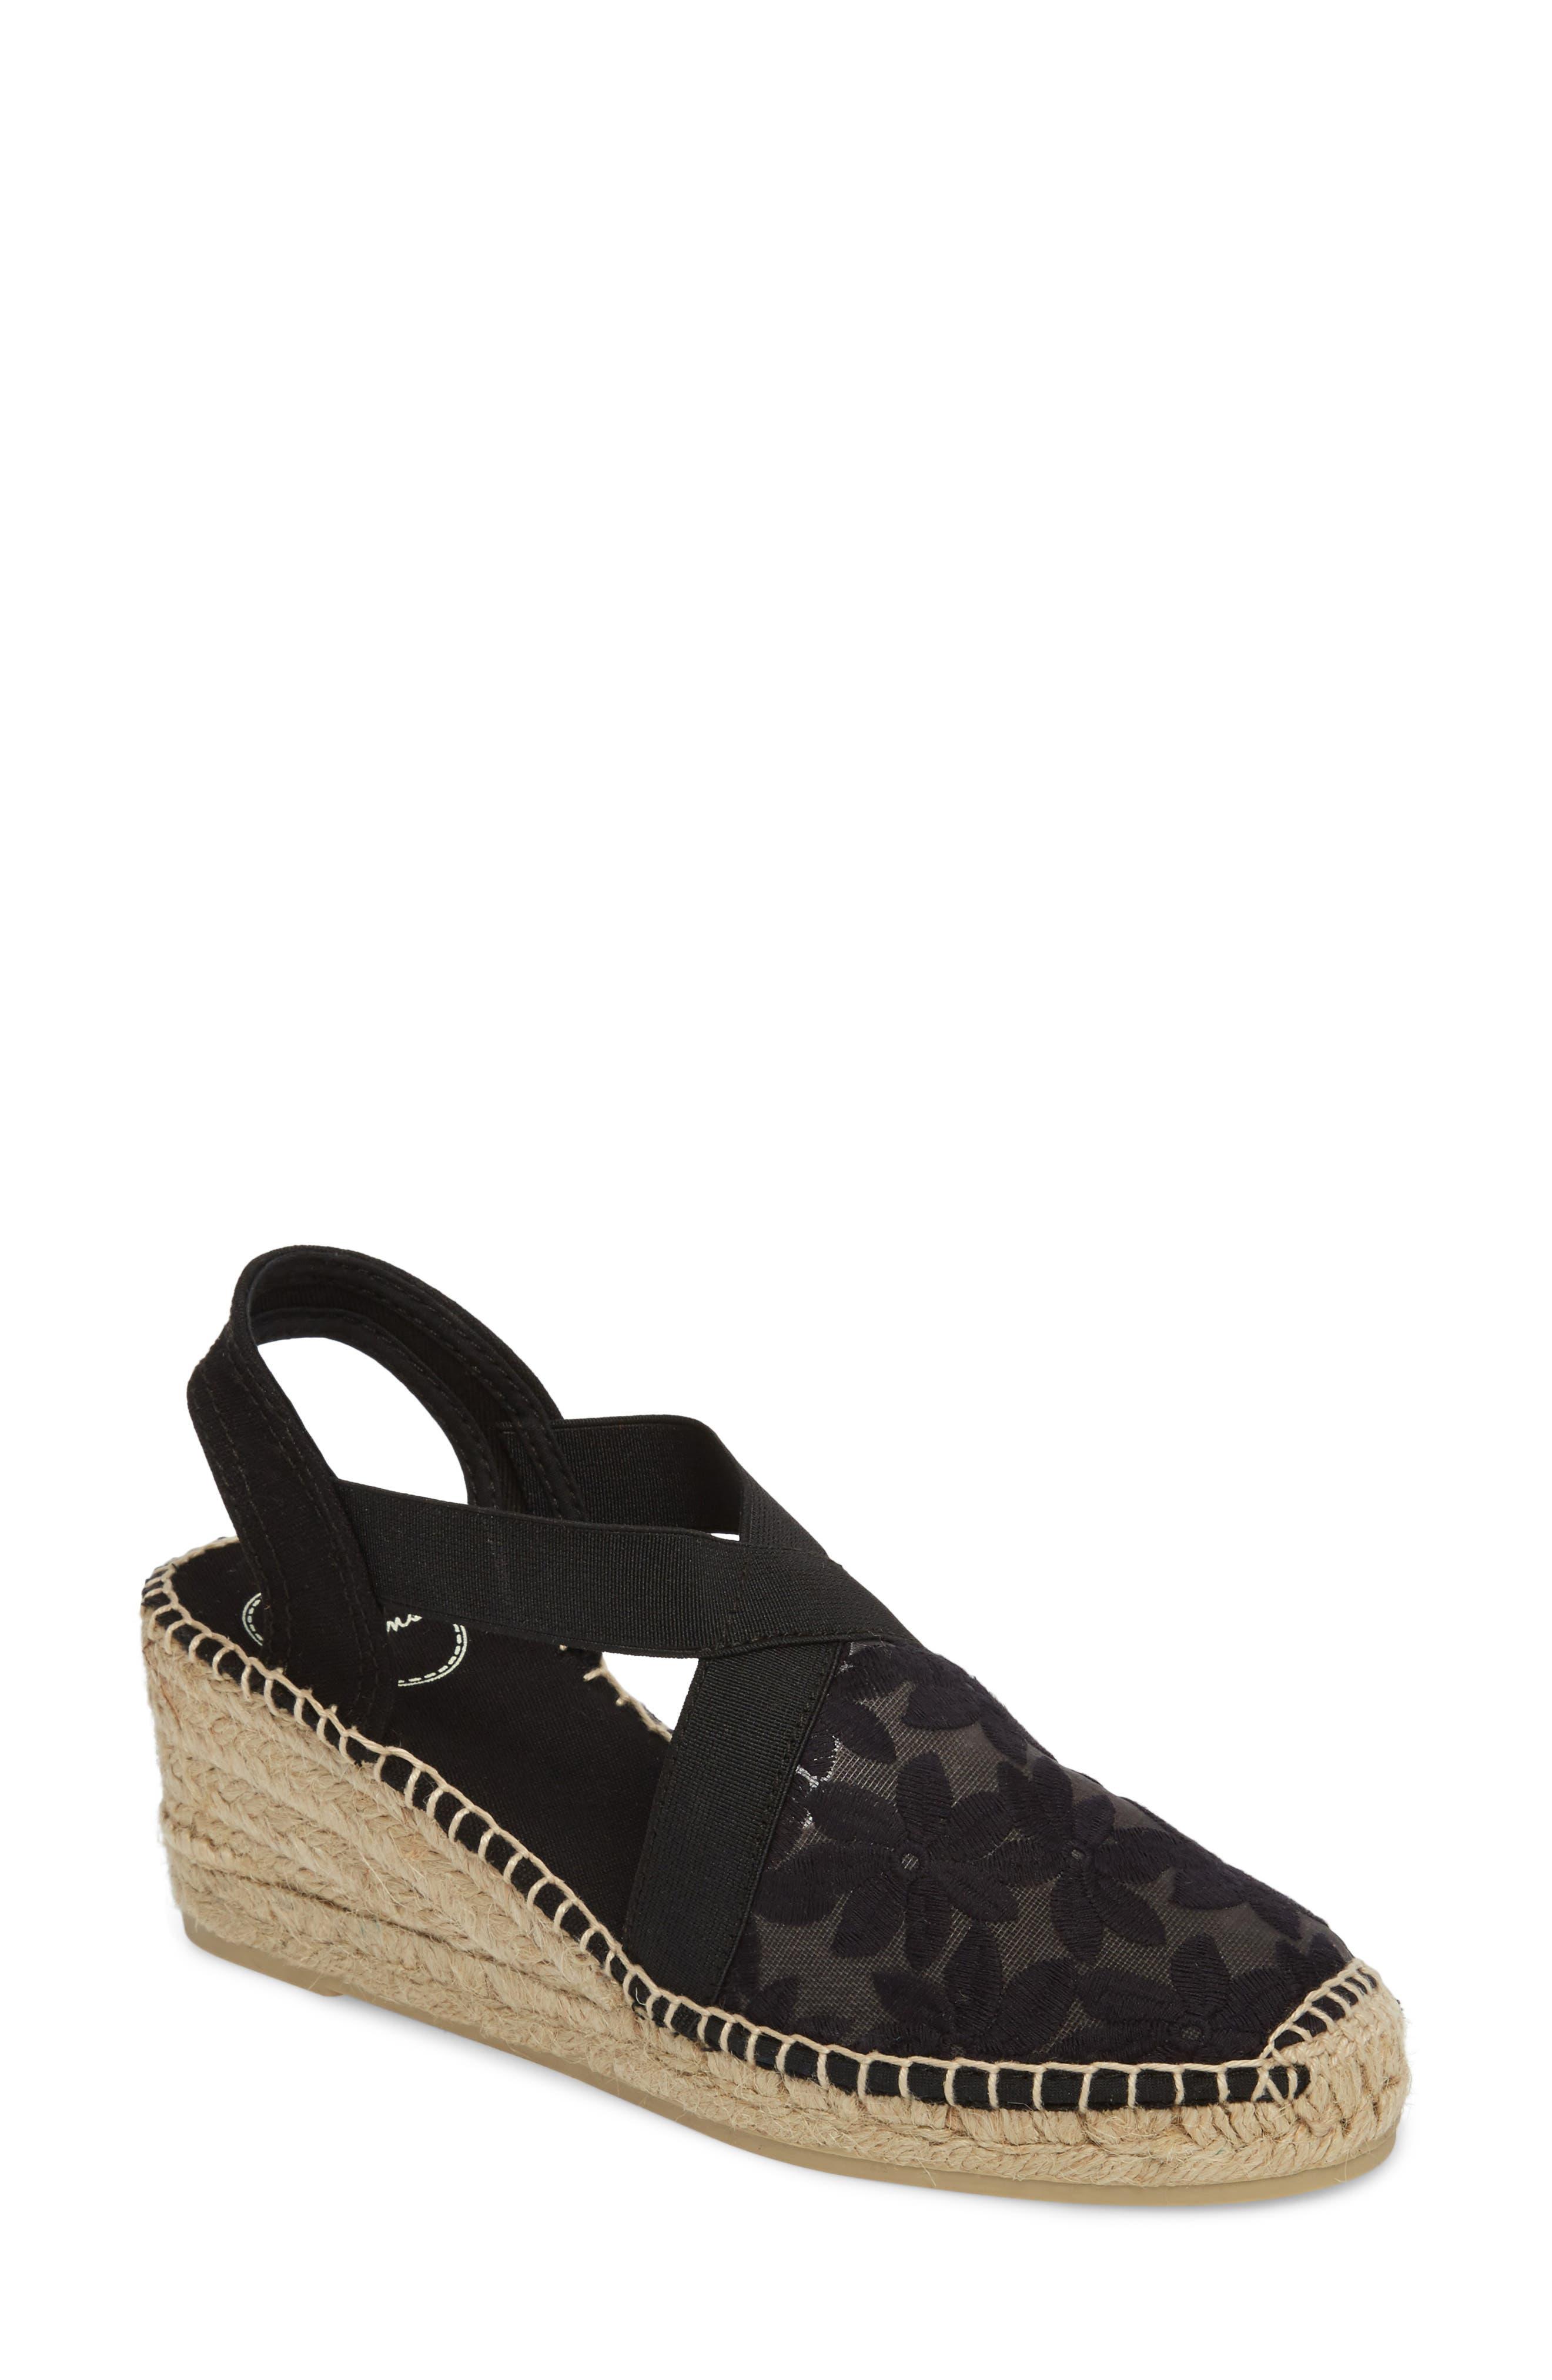 TONI PONS Terra Espadrille Wedge Sandal, Main, color, BLACK FABRIC